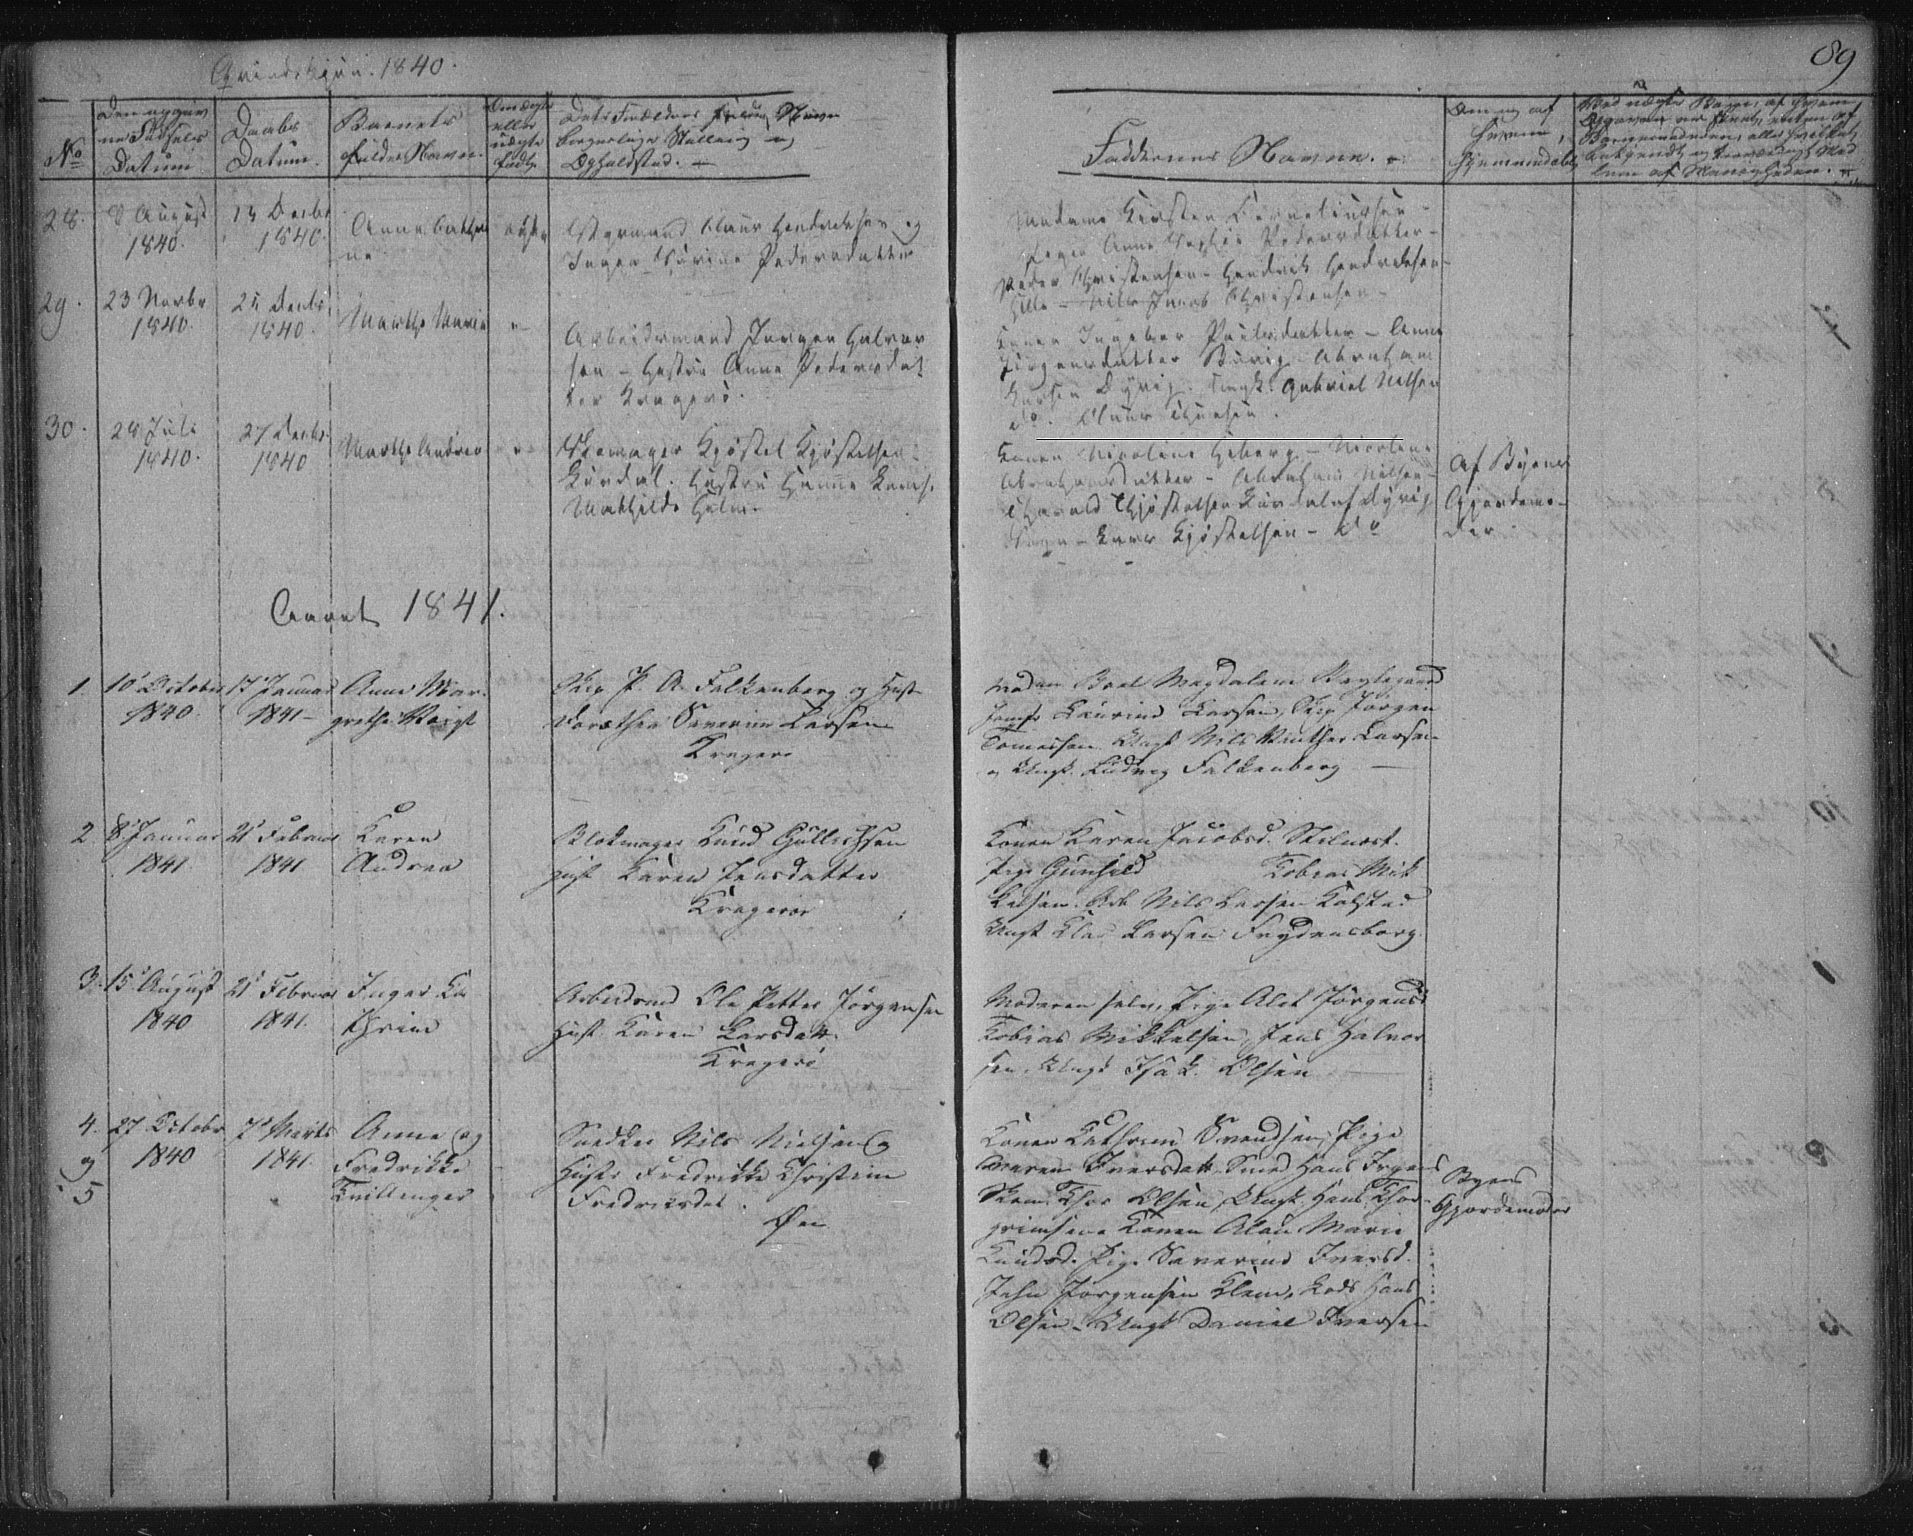 SAKO, Kragerø kirkebøker, F/Fa/L0005: Ministerialbok nr. 5, 1832-1847, s. 89